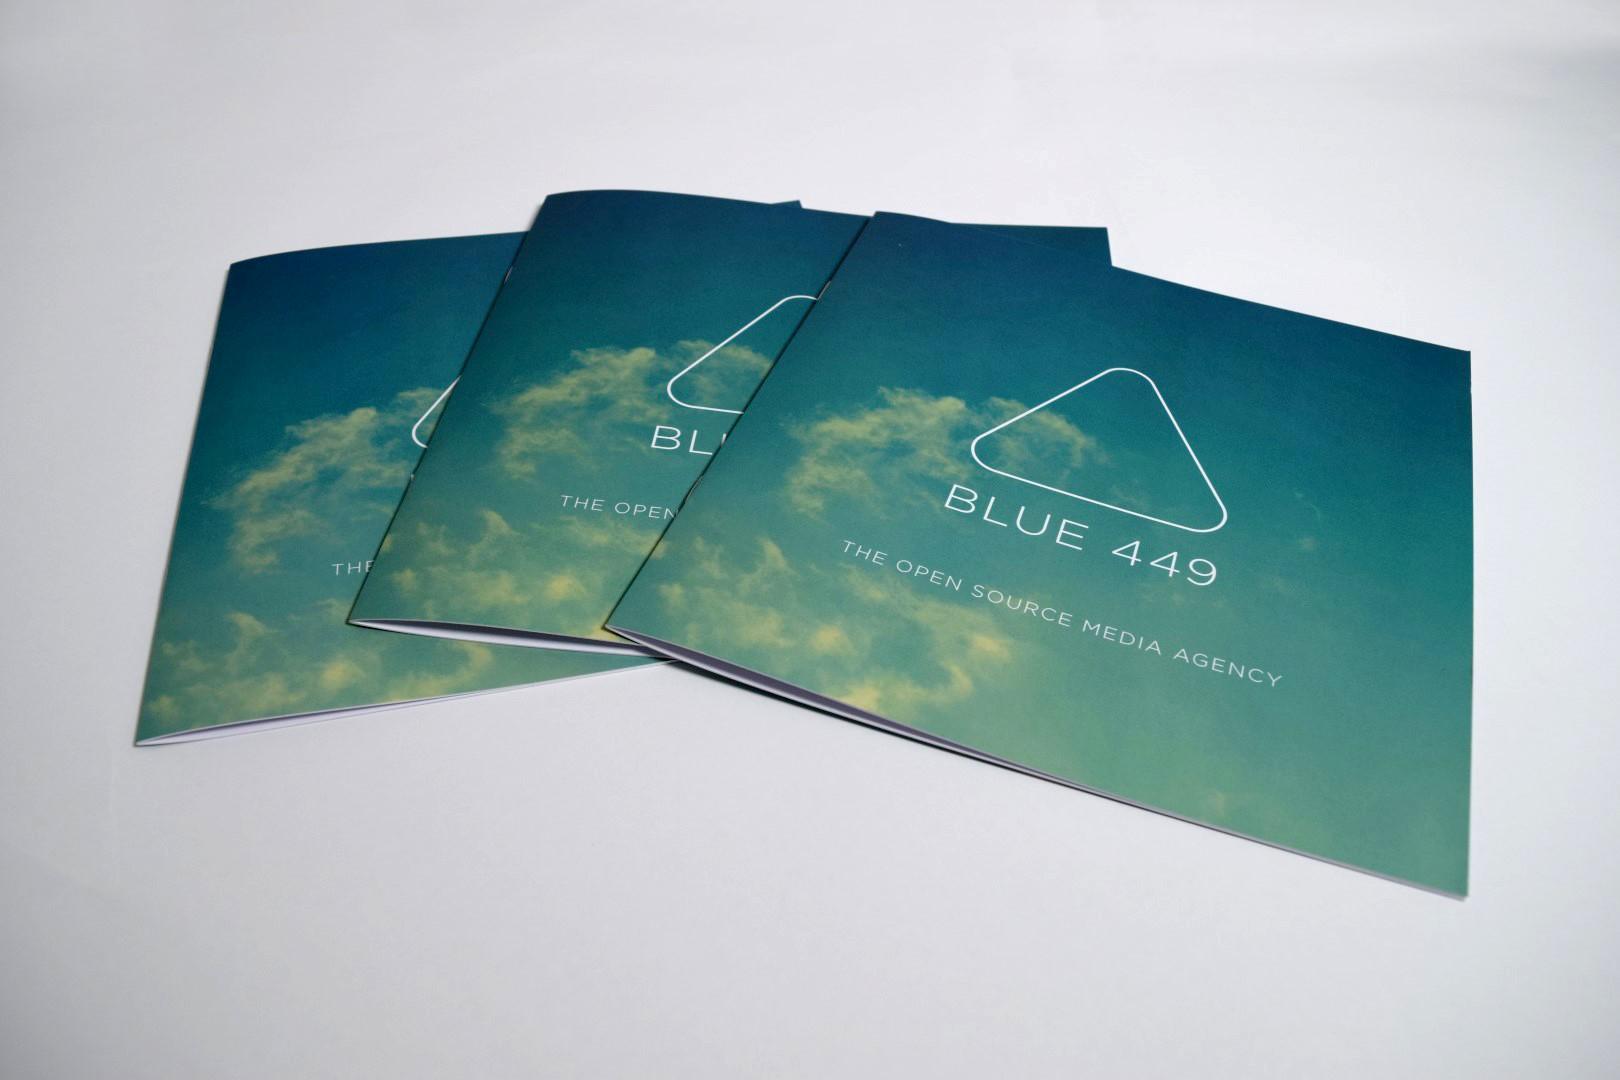 Blue 449 Brochure